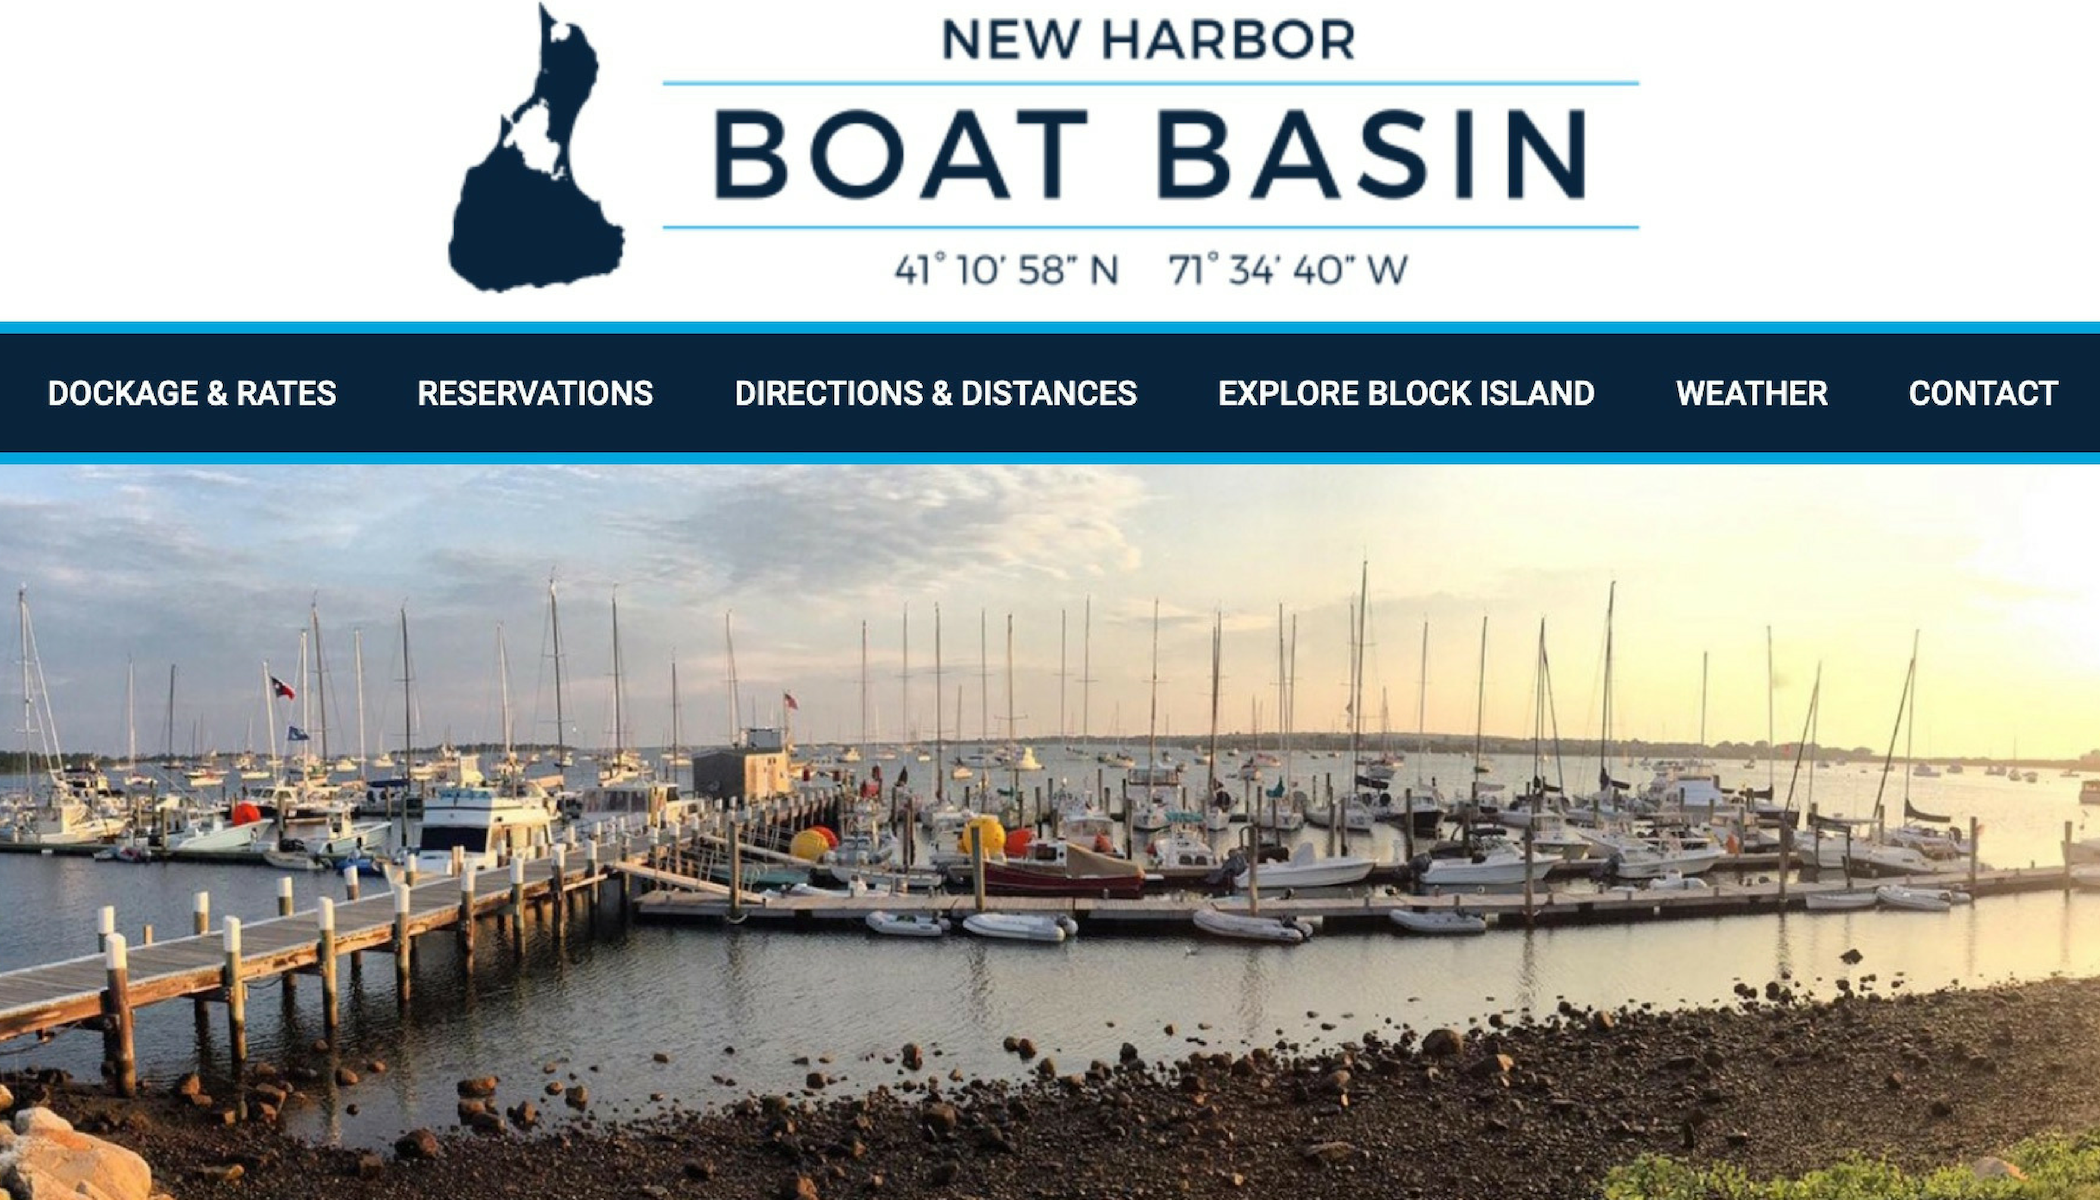 New Harbor Boat Basin on Block Island - new website